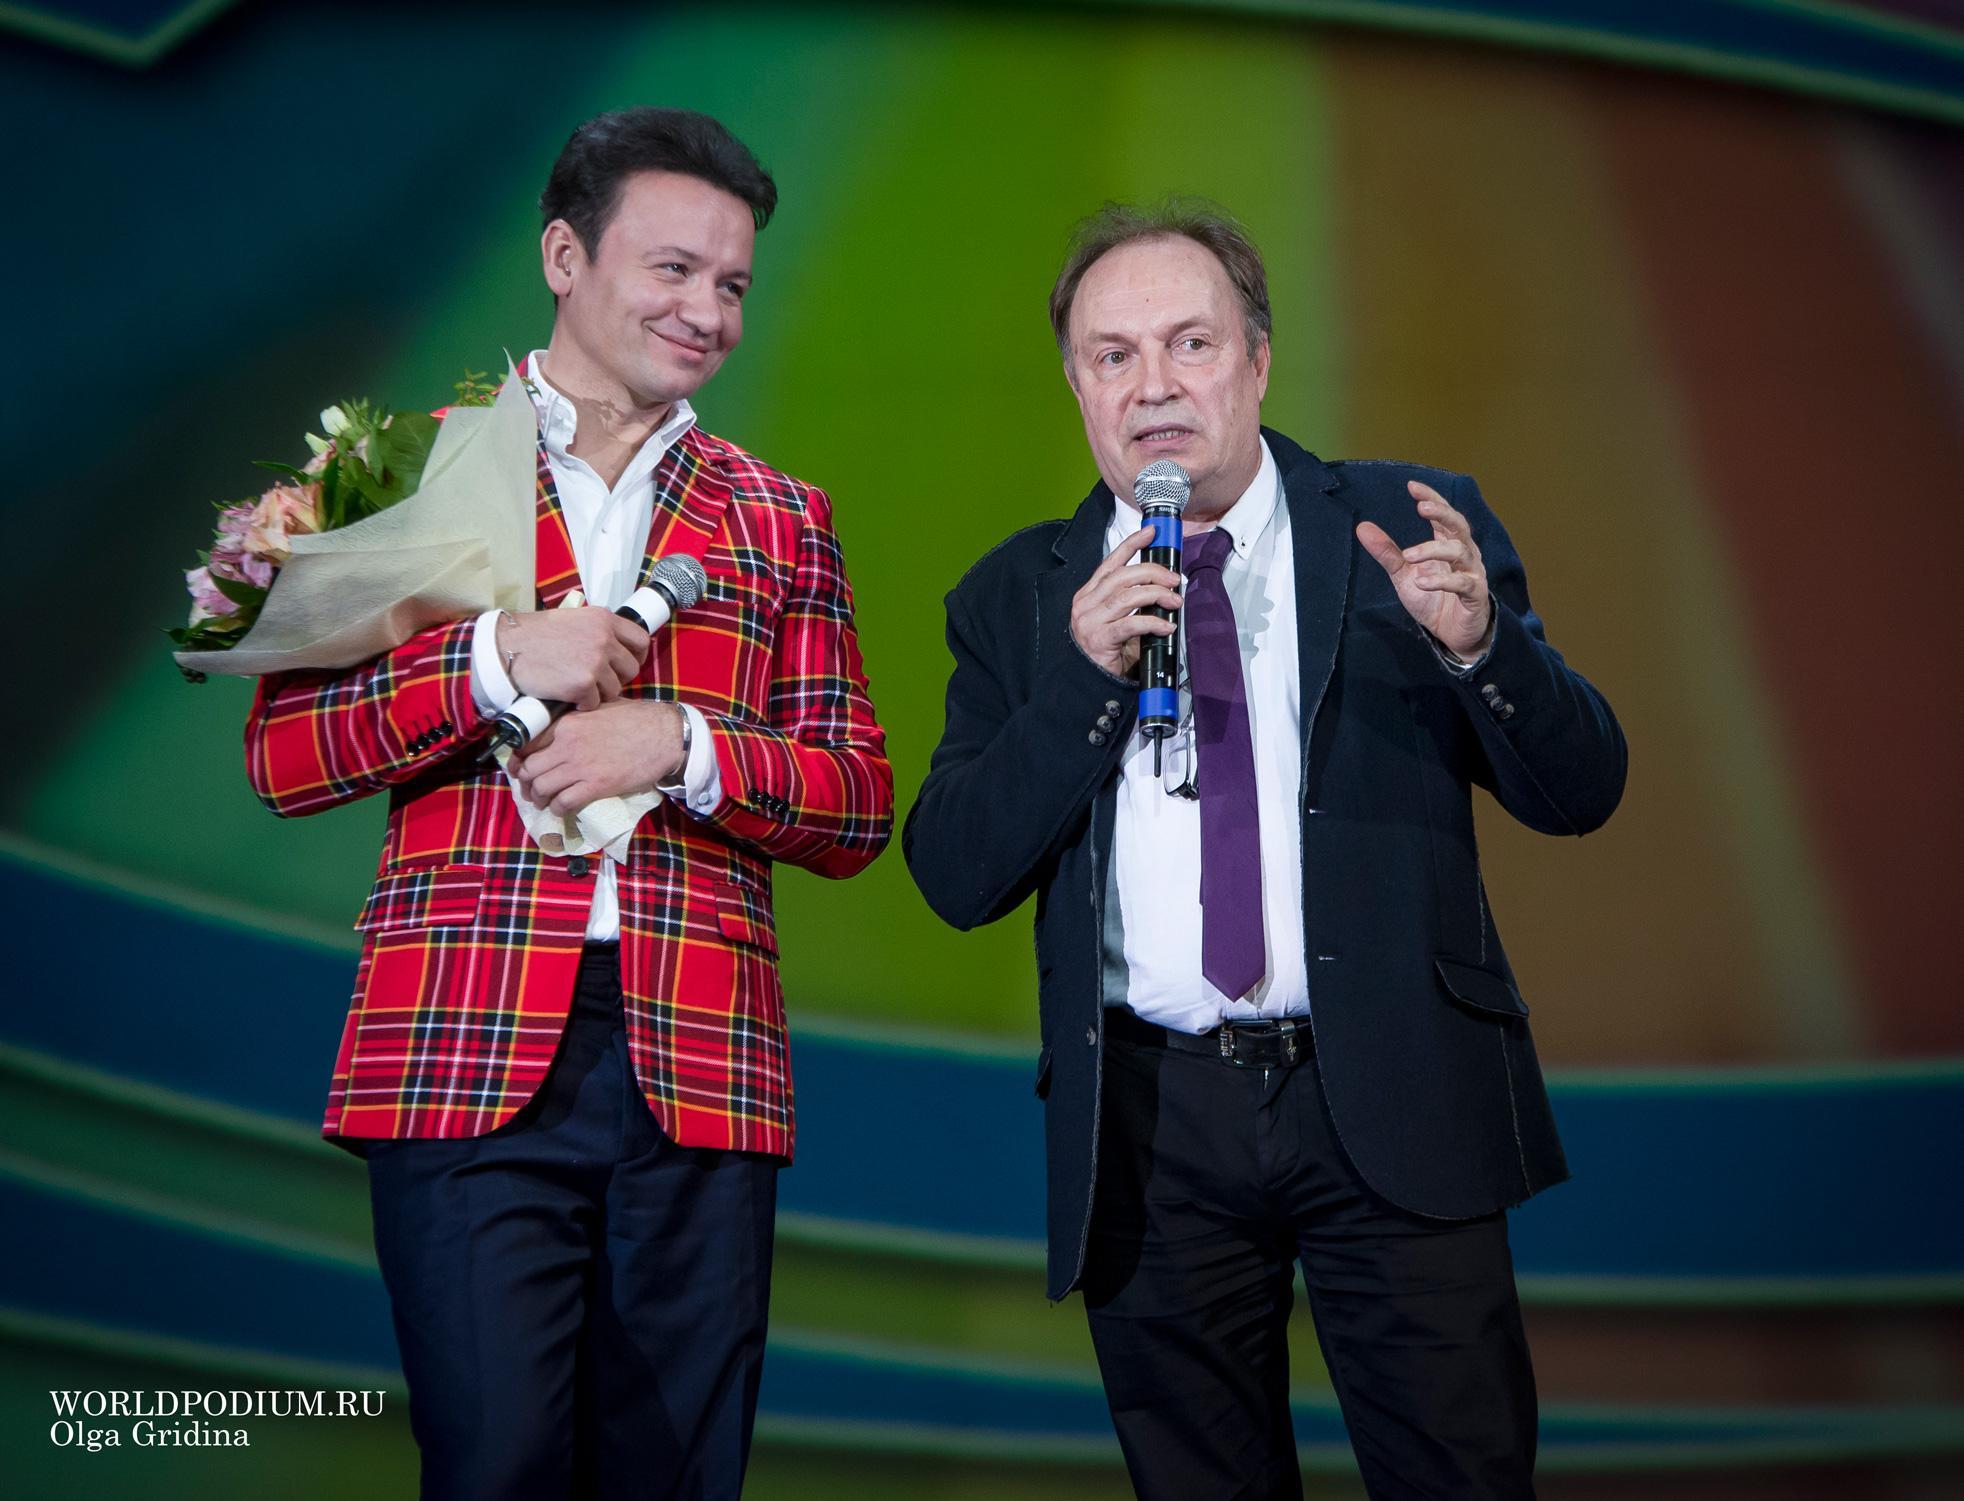 Александр Олешко и Руслан Алехно поддержат участников фестиваля «FOLK БЕЗ ГРАНИЦ»